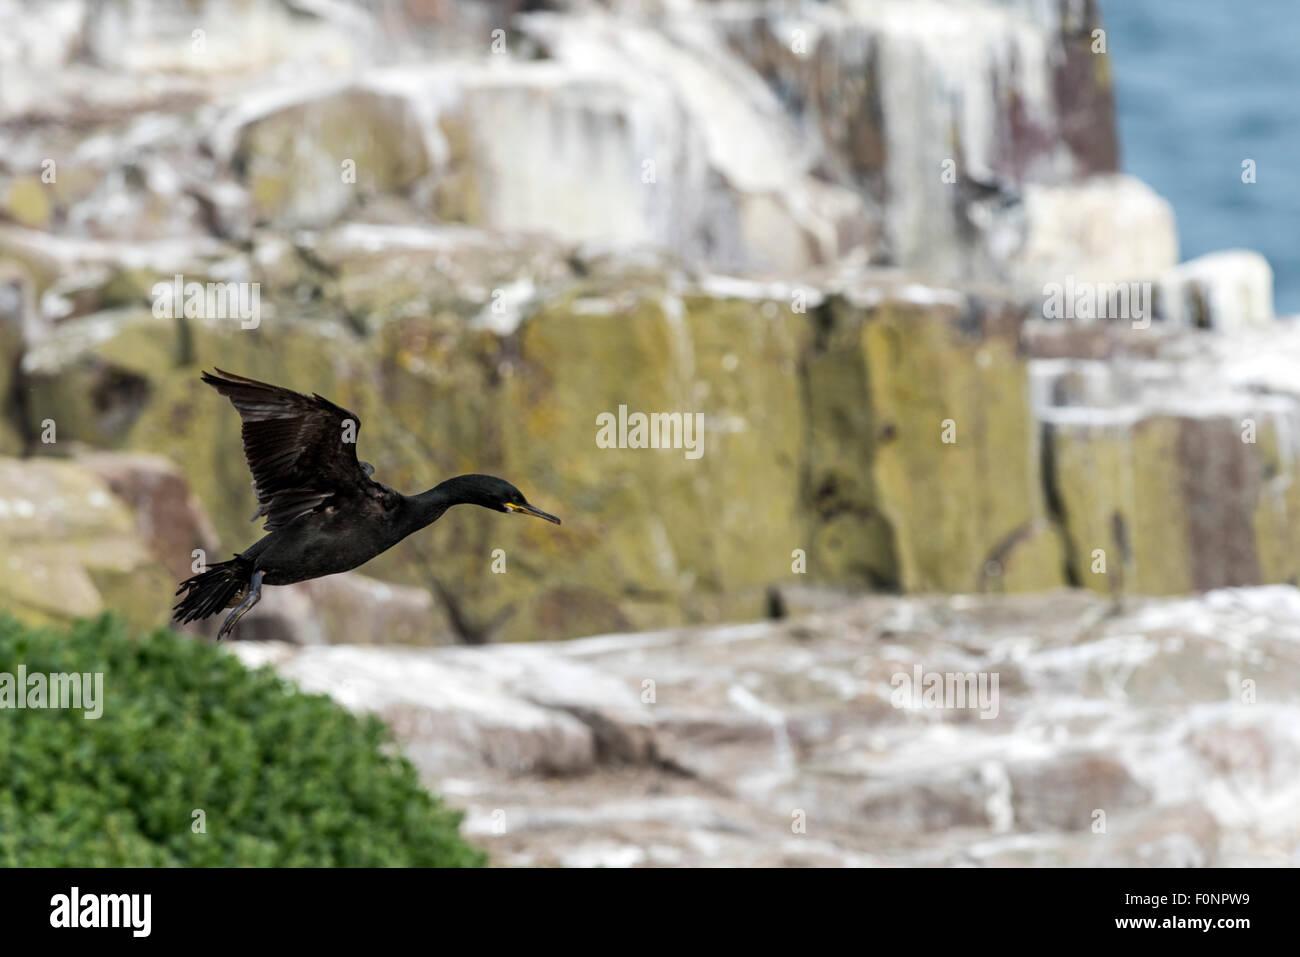 Shag in flight (Phalacrocorax aristotelis) Farne Islands, England, Great Britain, United Kingdom - Stock Image